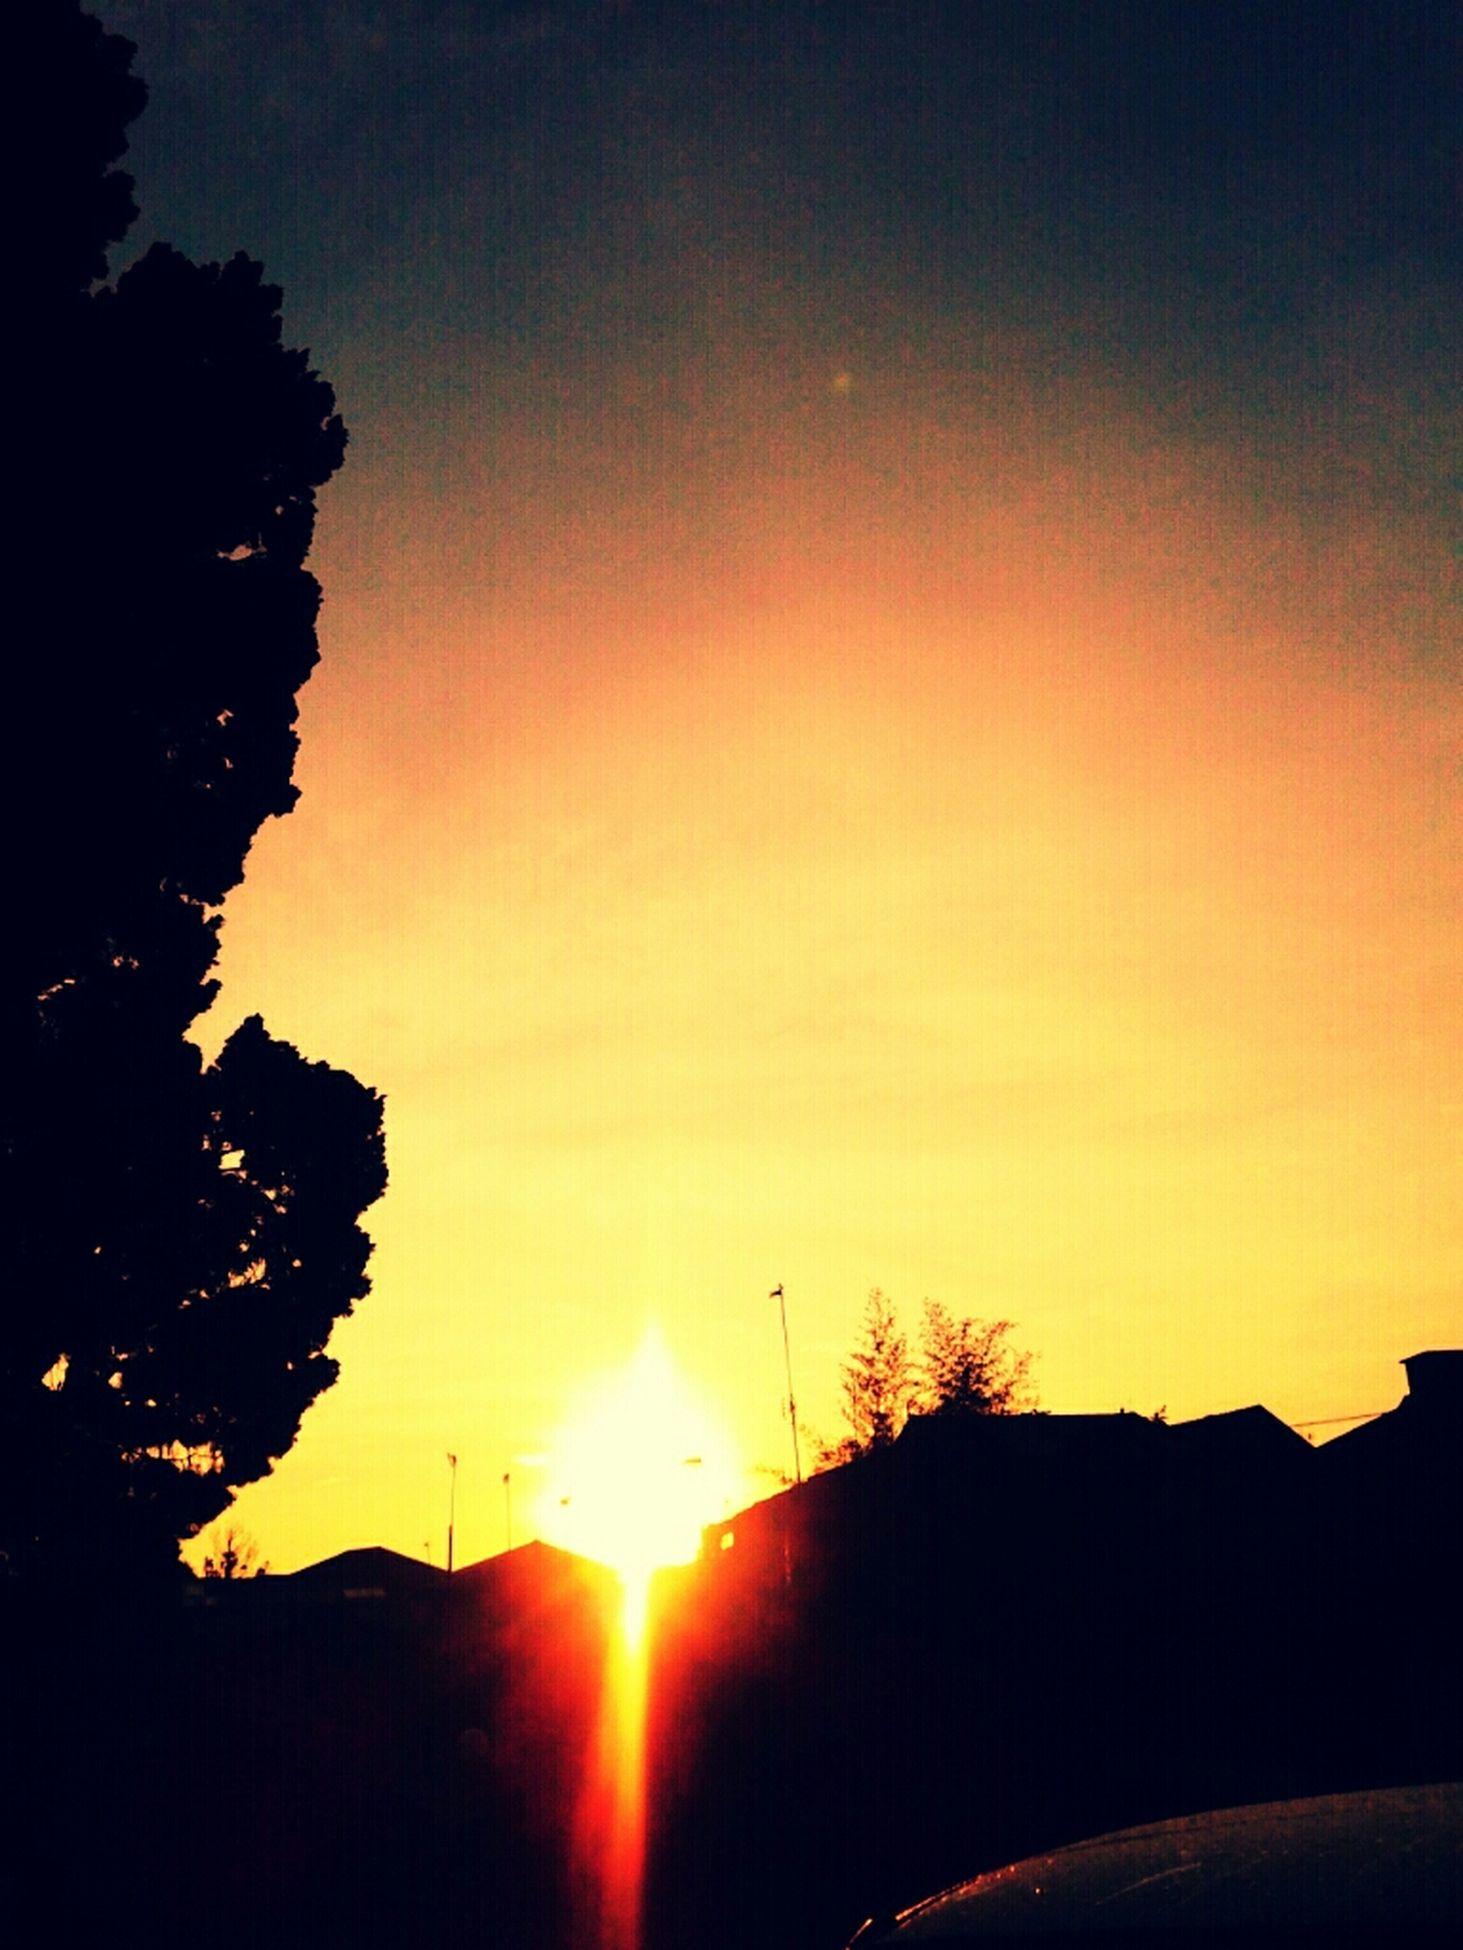 sunset, sun, silhouette, scenics, orange color, tranquil scene, beauty in nature, tranquility, sky, idyllic, nature, sunlight, landscape, tree, majestic, outdoors, no people, back lit, non urban scene, non-urban scene